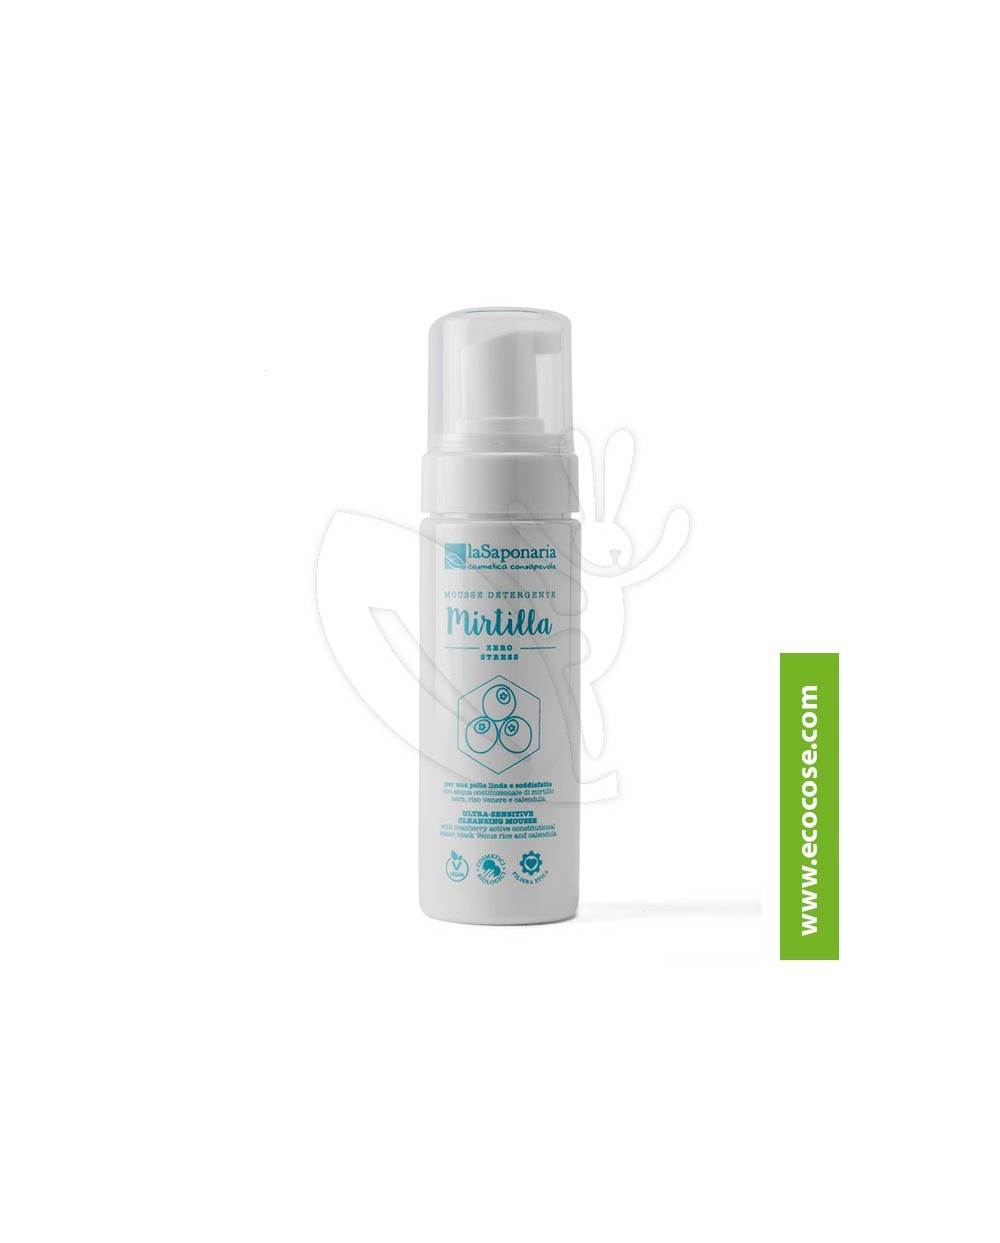 La Saponaria - Costituzionale - Mousse detergente Mirtilla